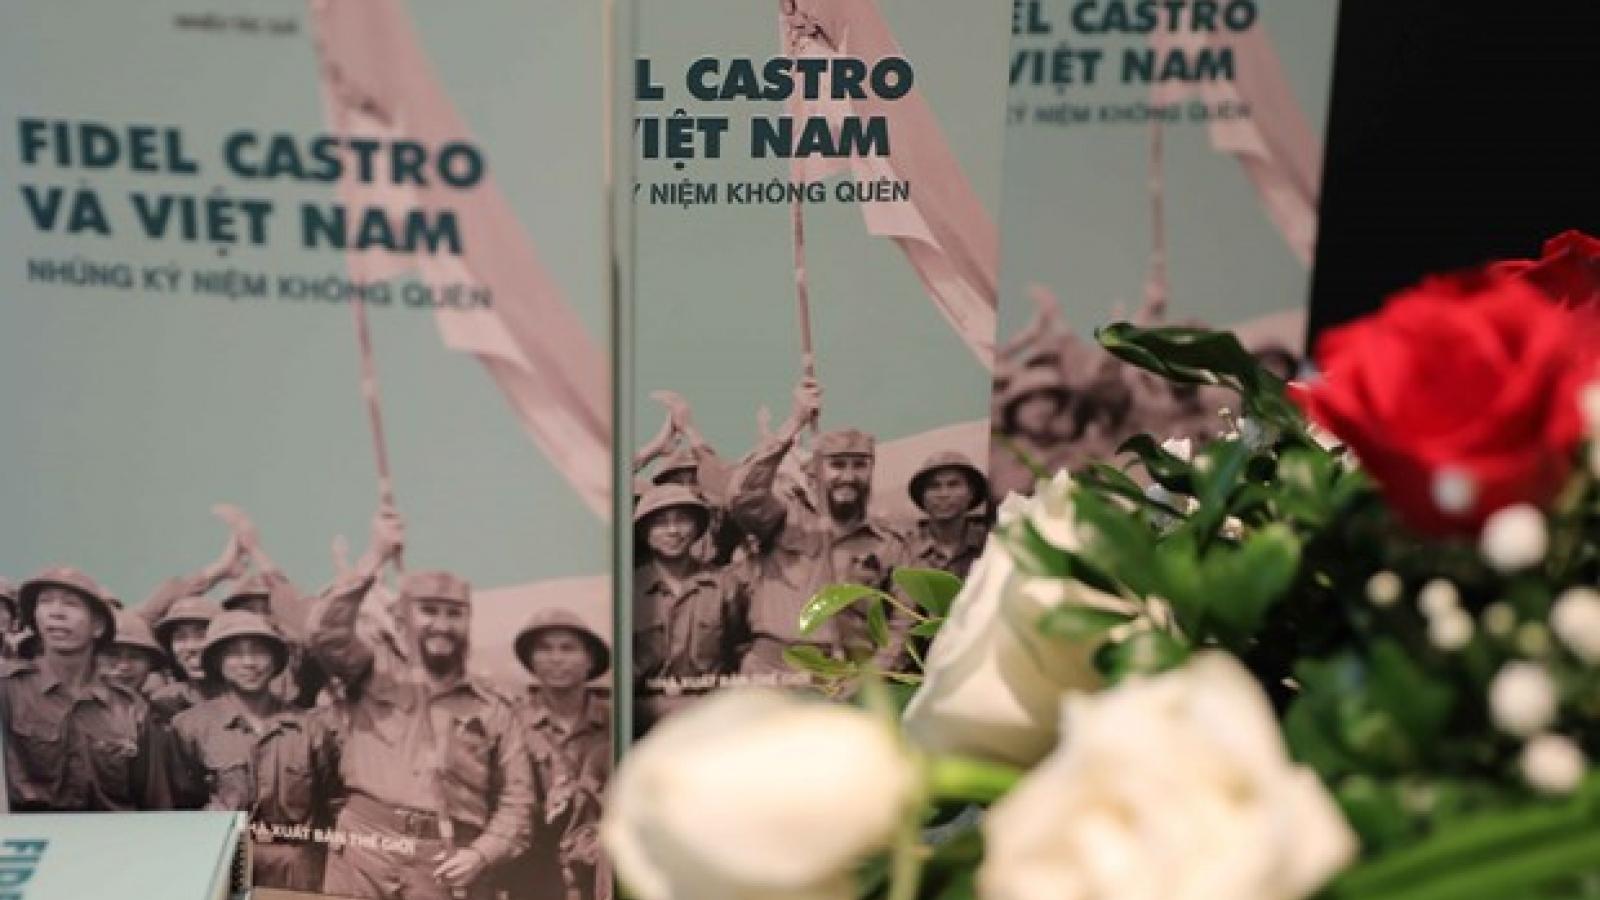 Book on Fidel Castro and Vietnam debuts